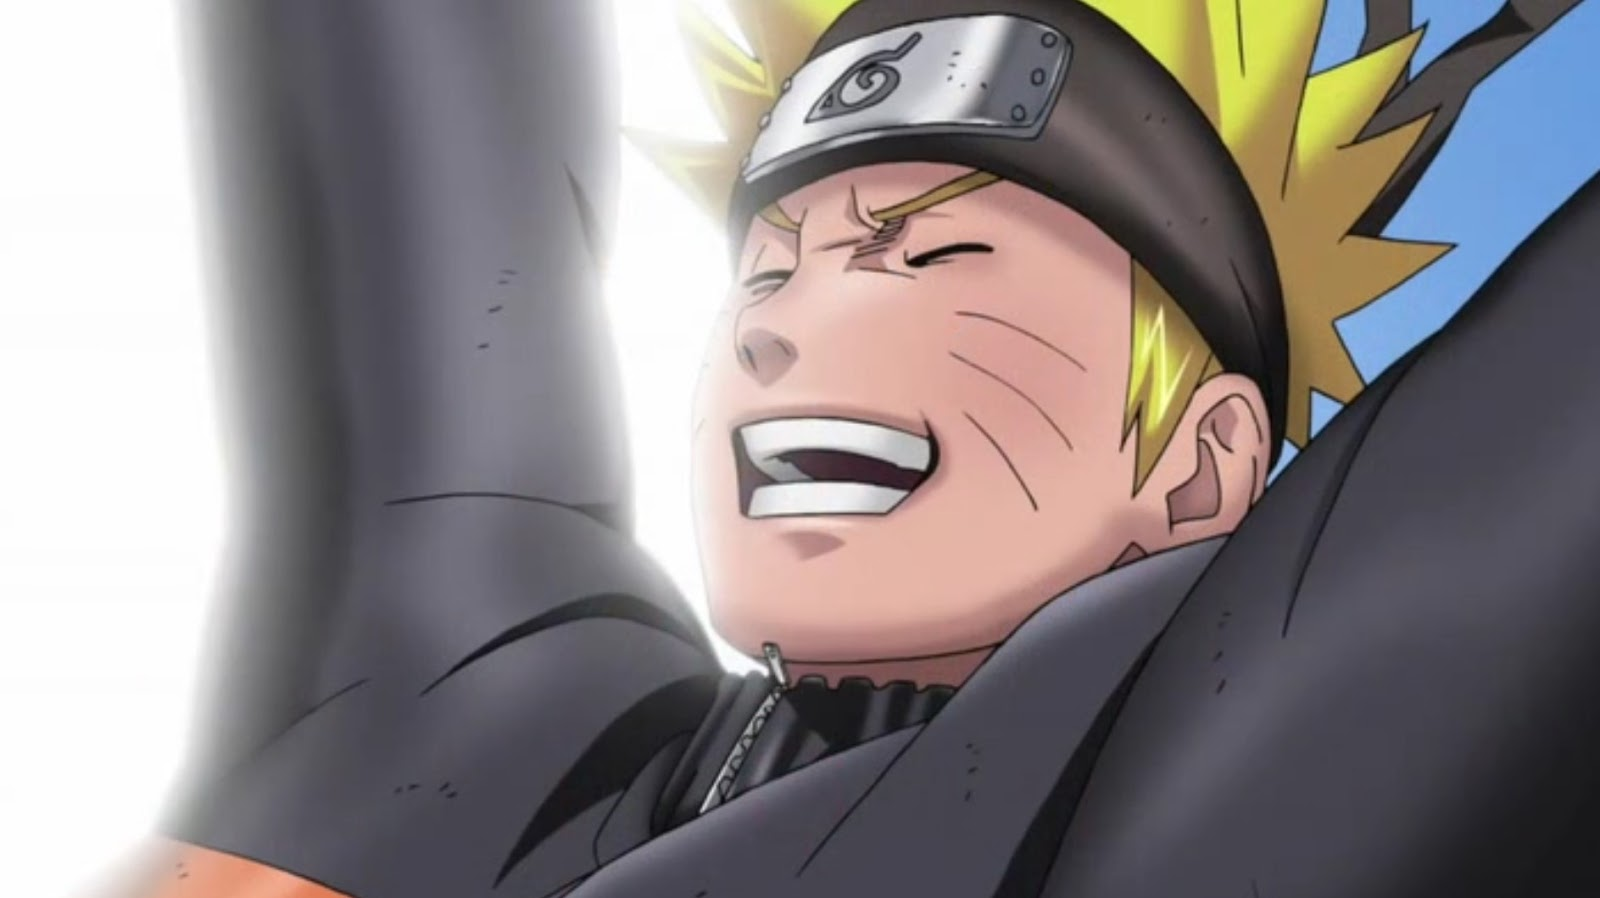 Naruto Shippuden: Episódio 175 – O Herói da Vila da Folha